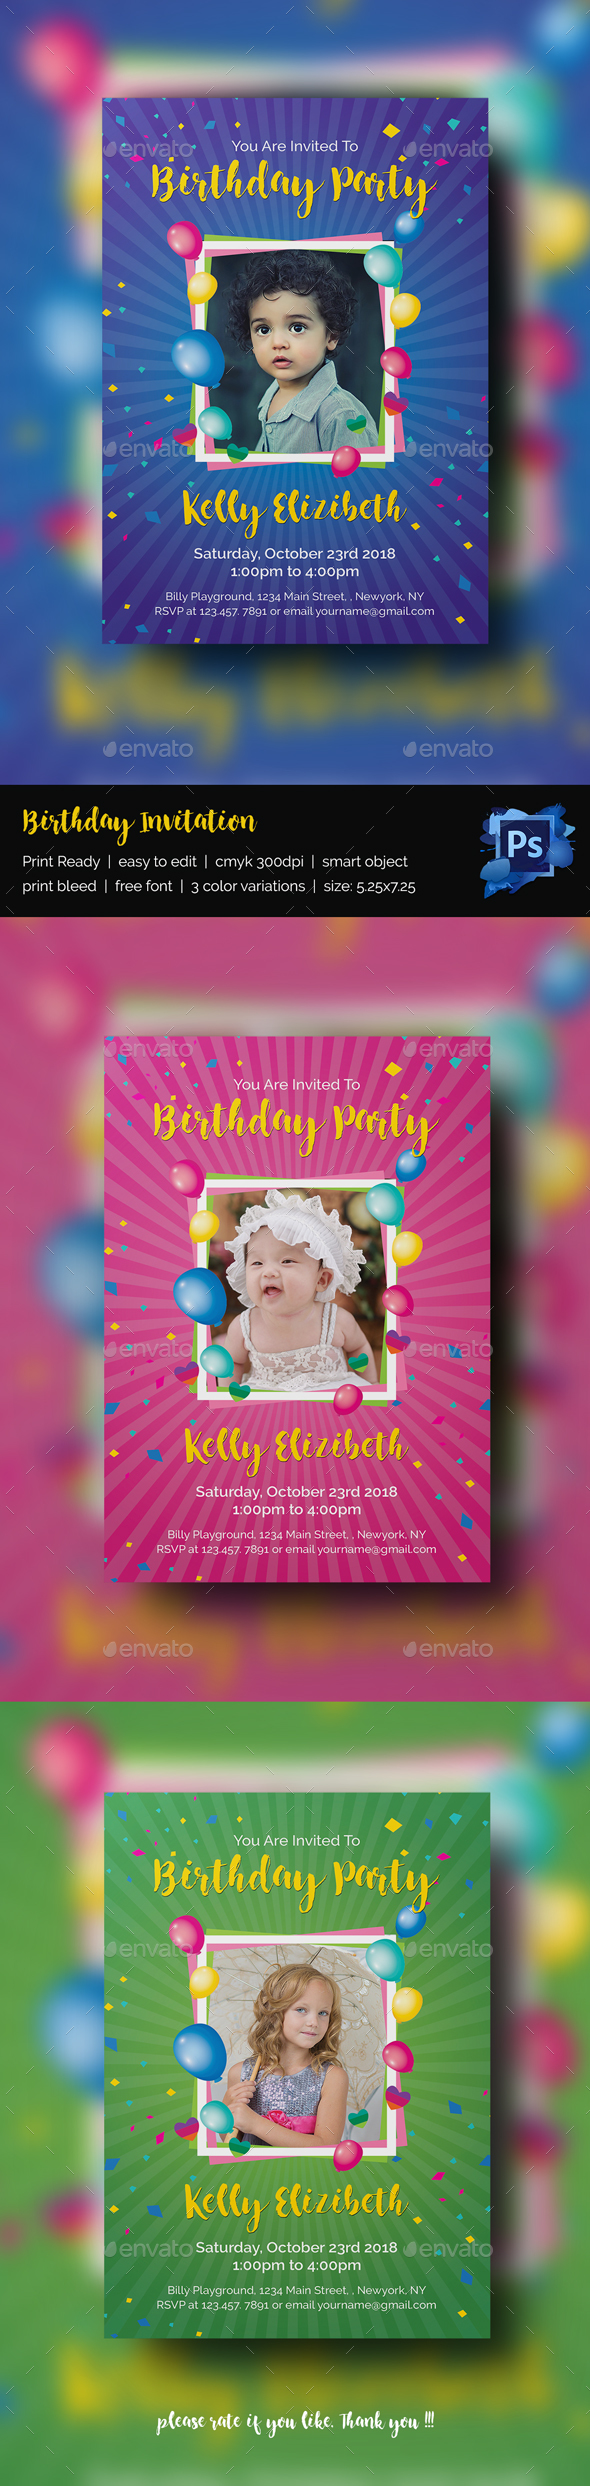 Birthday Invitation - Print Templates